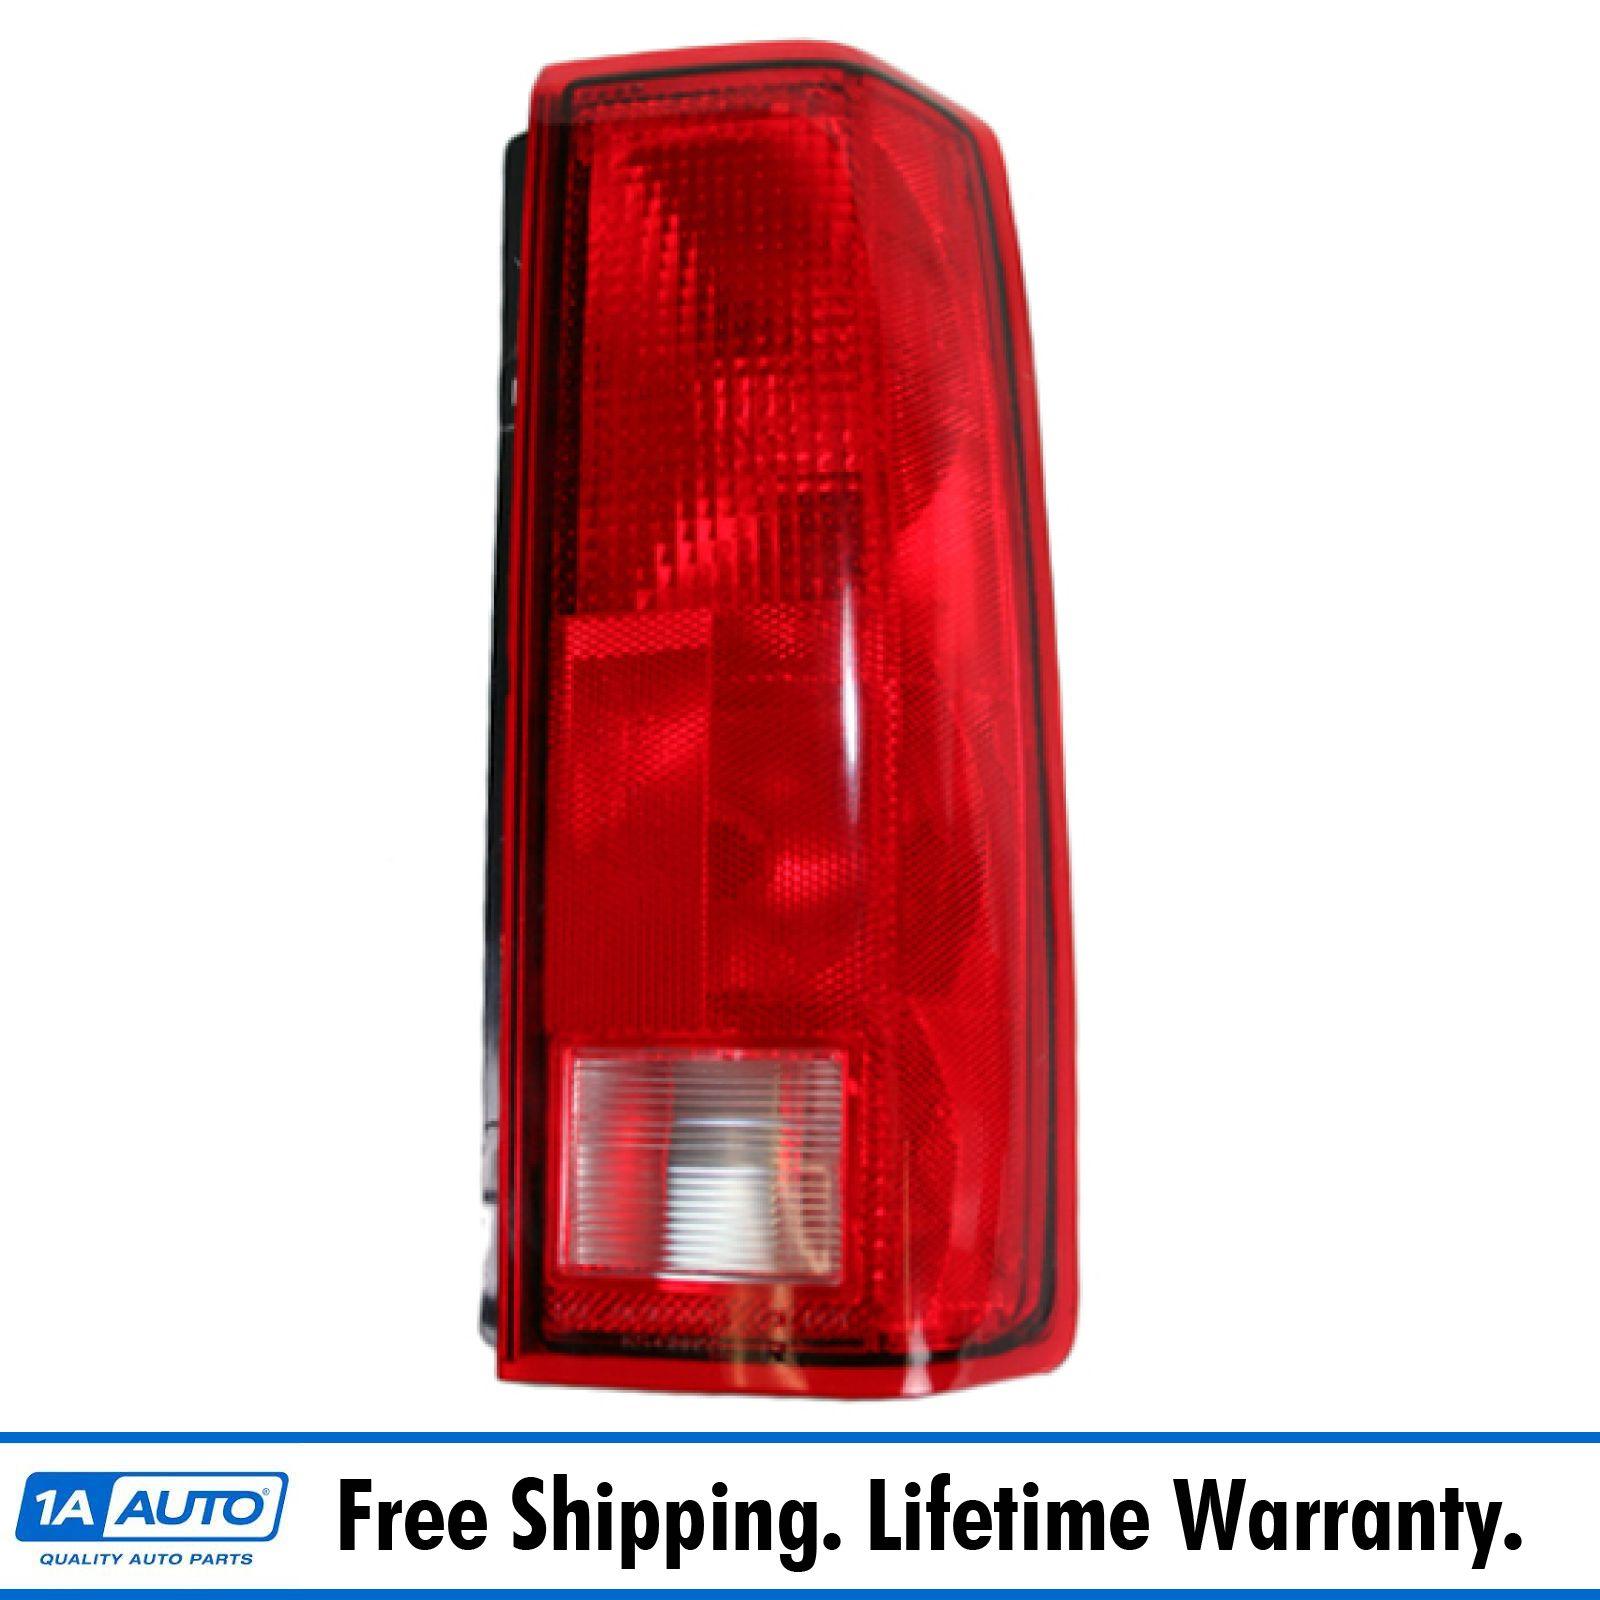 Taillight Taillamp Passenger Side Right Rear Brake Light